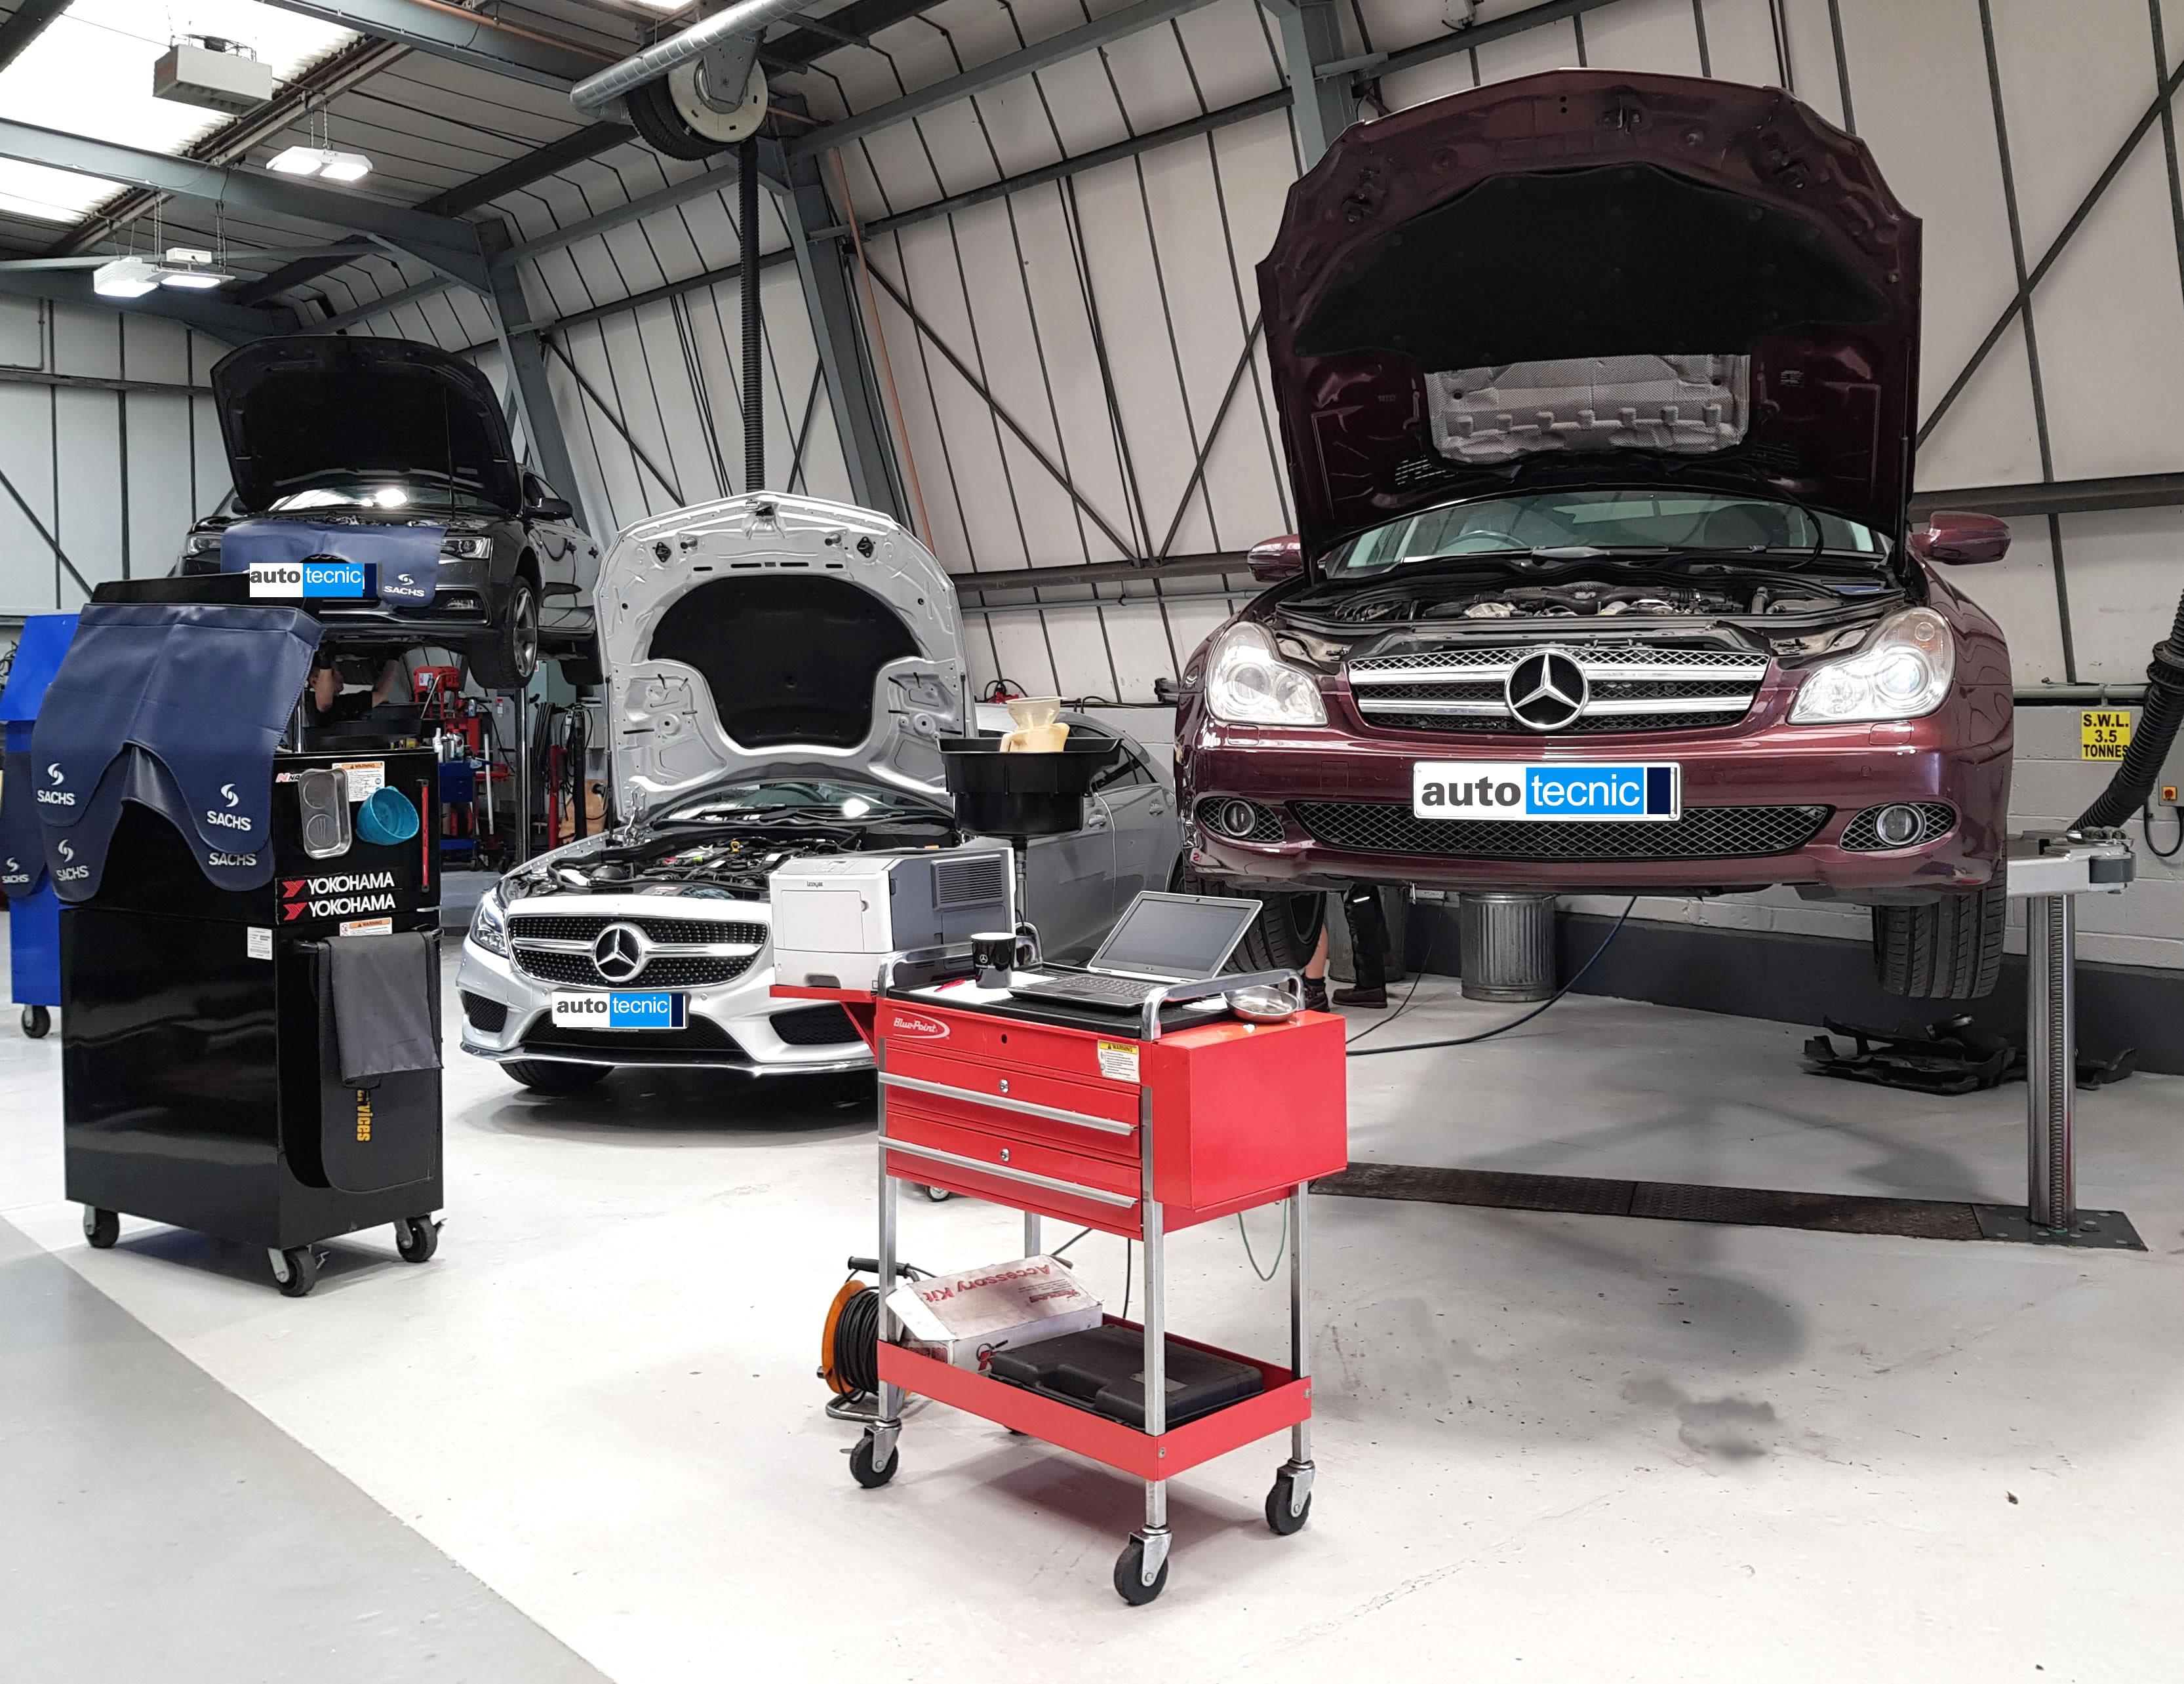 autoecnic - Mercededs Benz - Audi